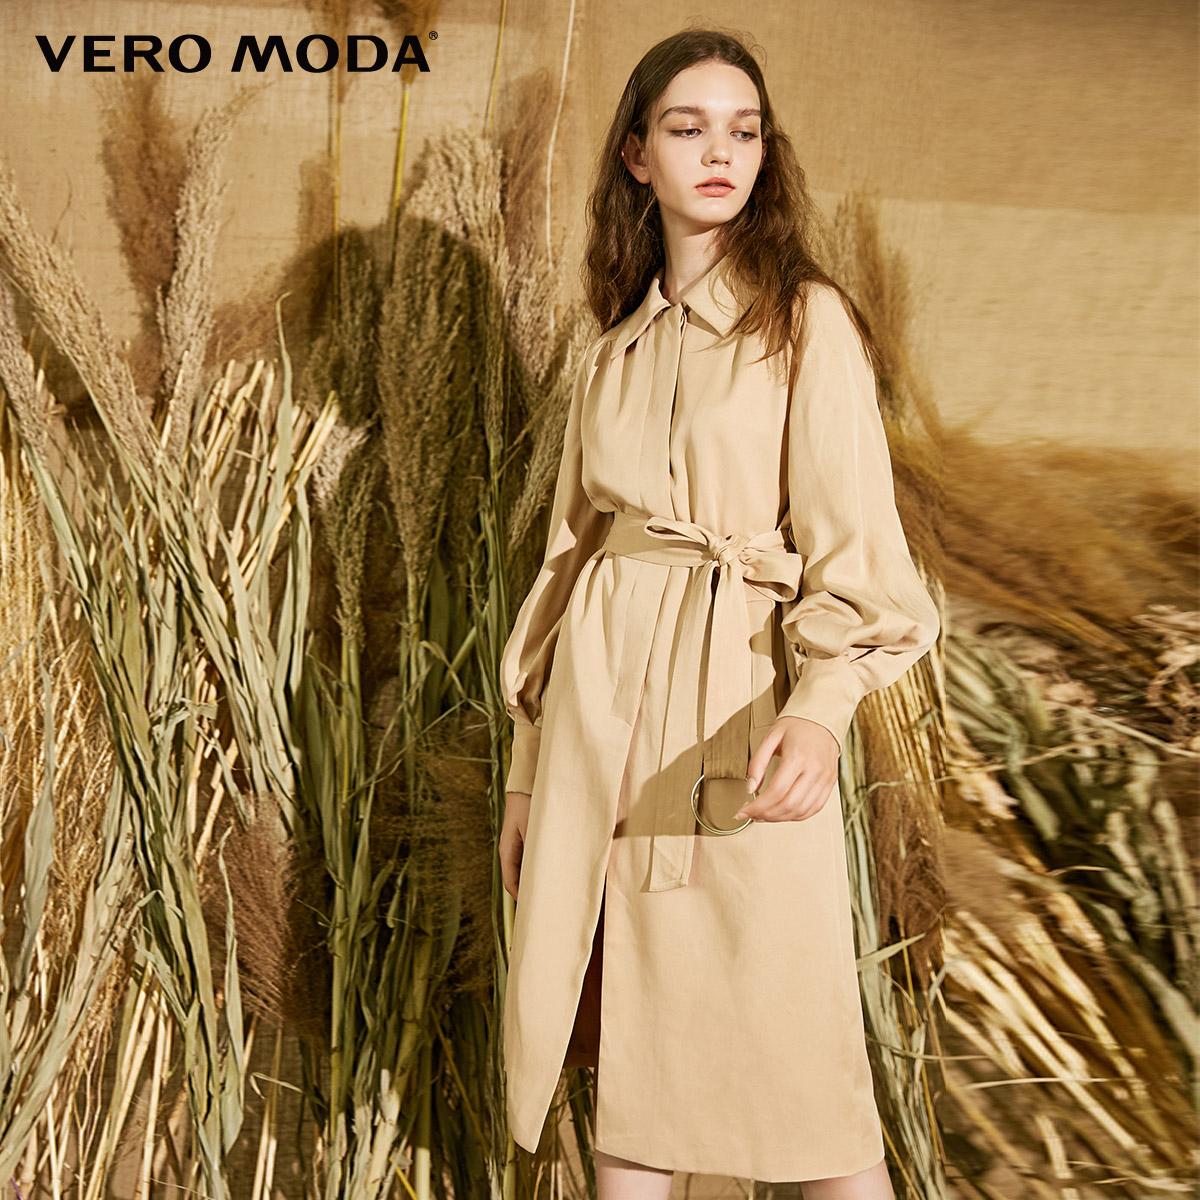 Vero Moda腰带灯笼袖风衣外套|317321532